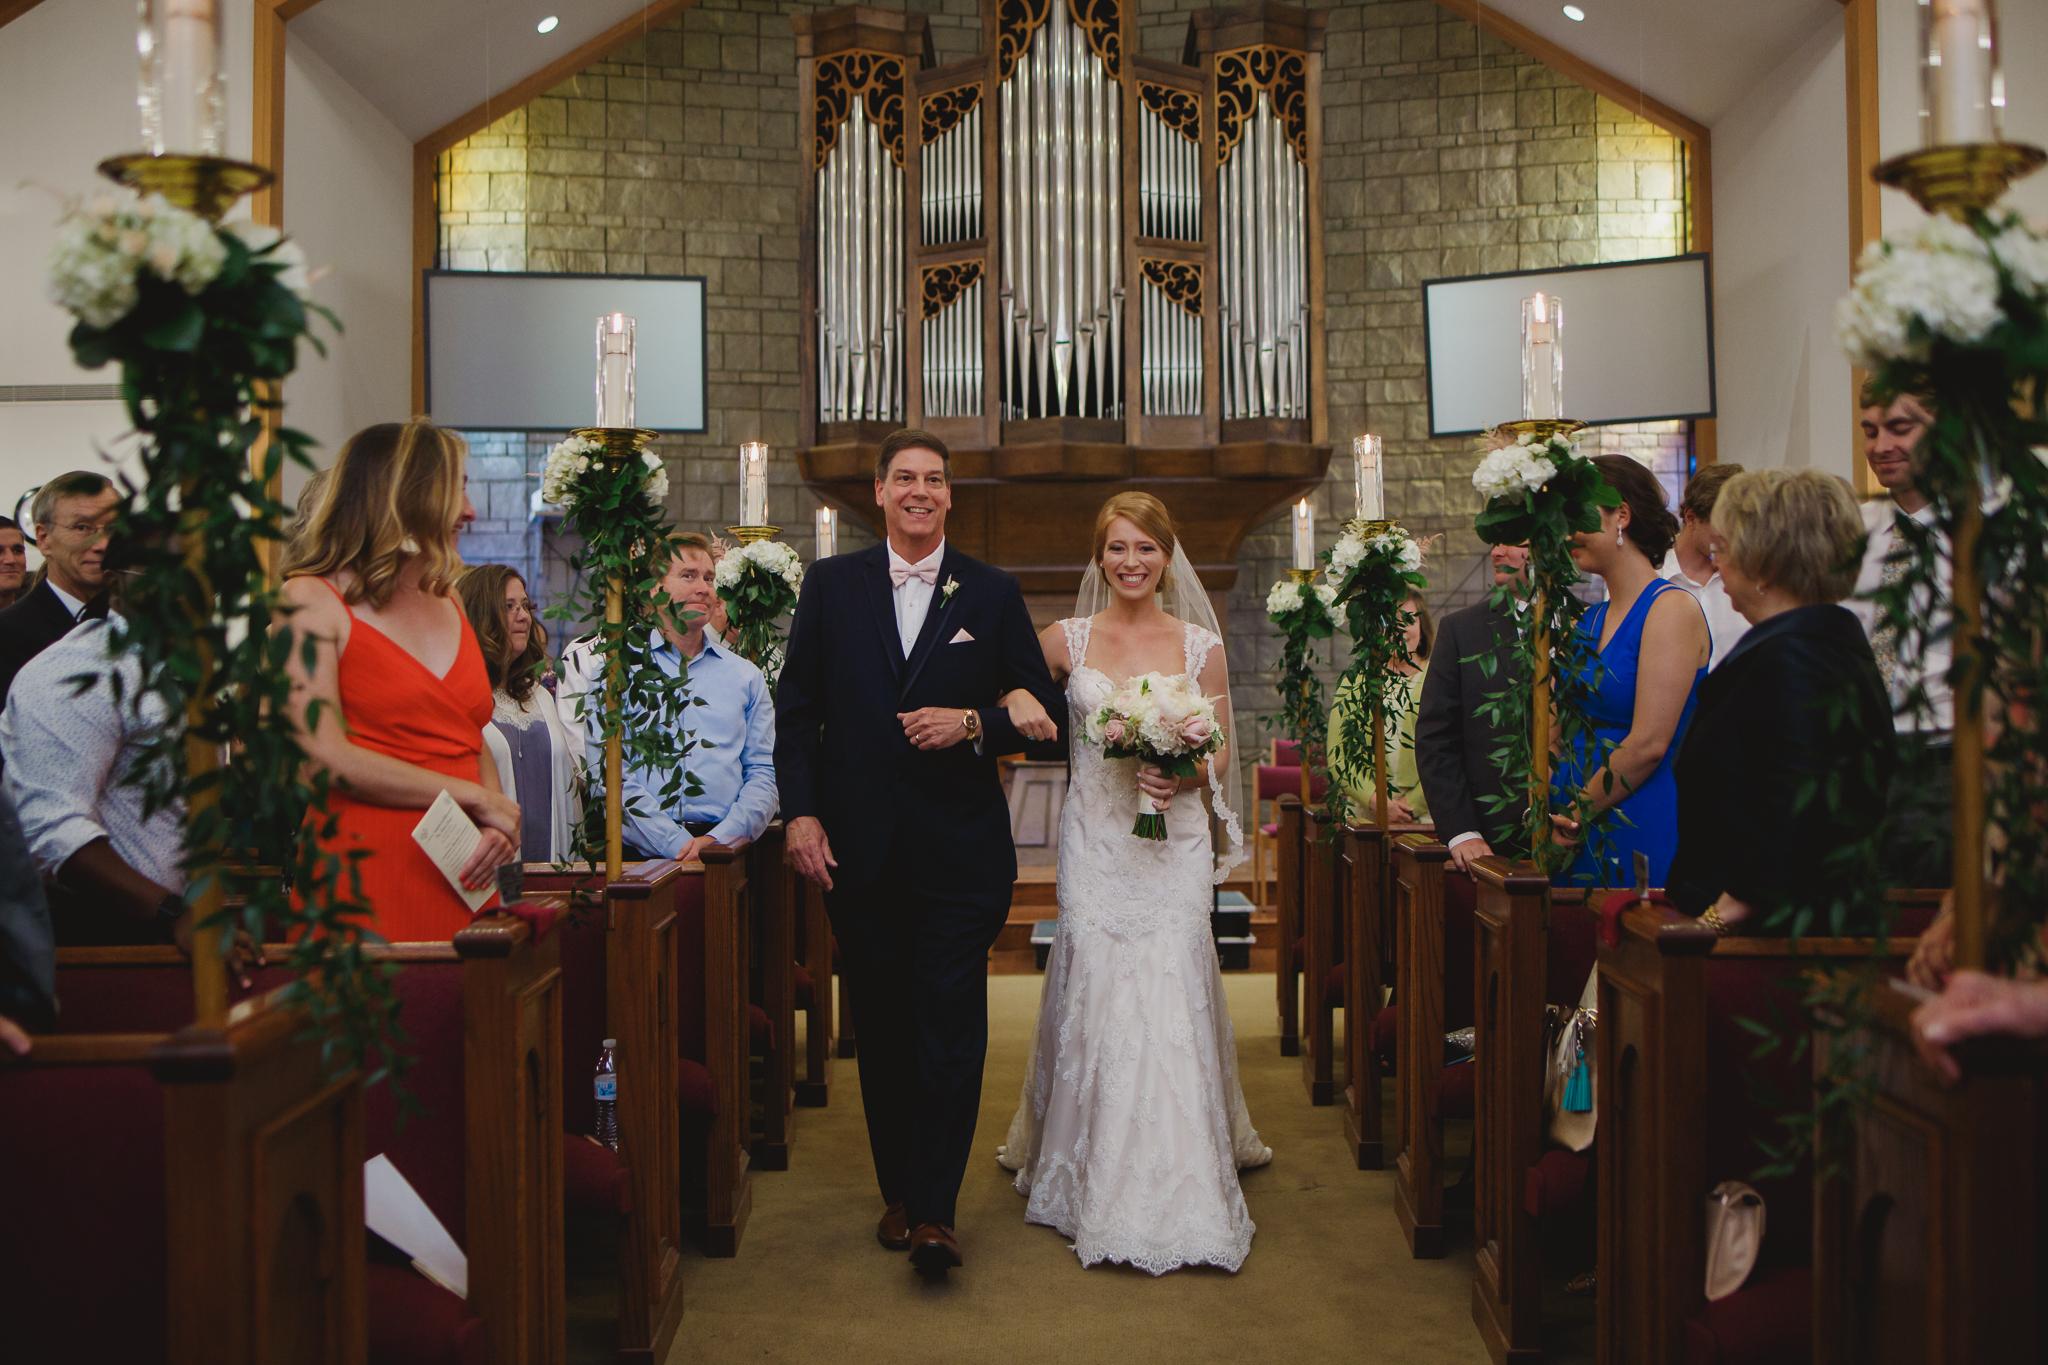 Michael and Kelly - the ashton depot - wedding DFW - wedding photographer- elizalde photography (31 of 150).jpg